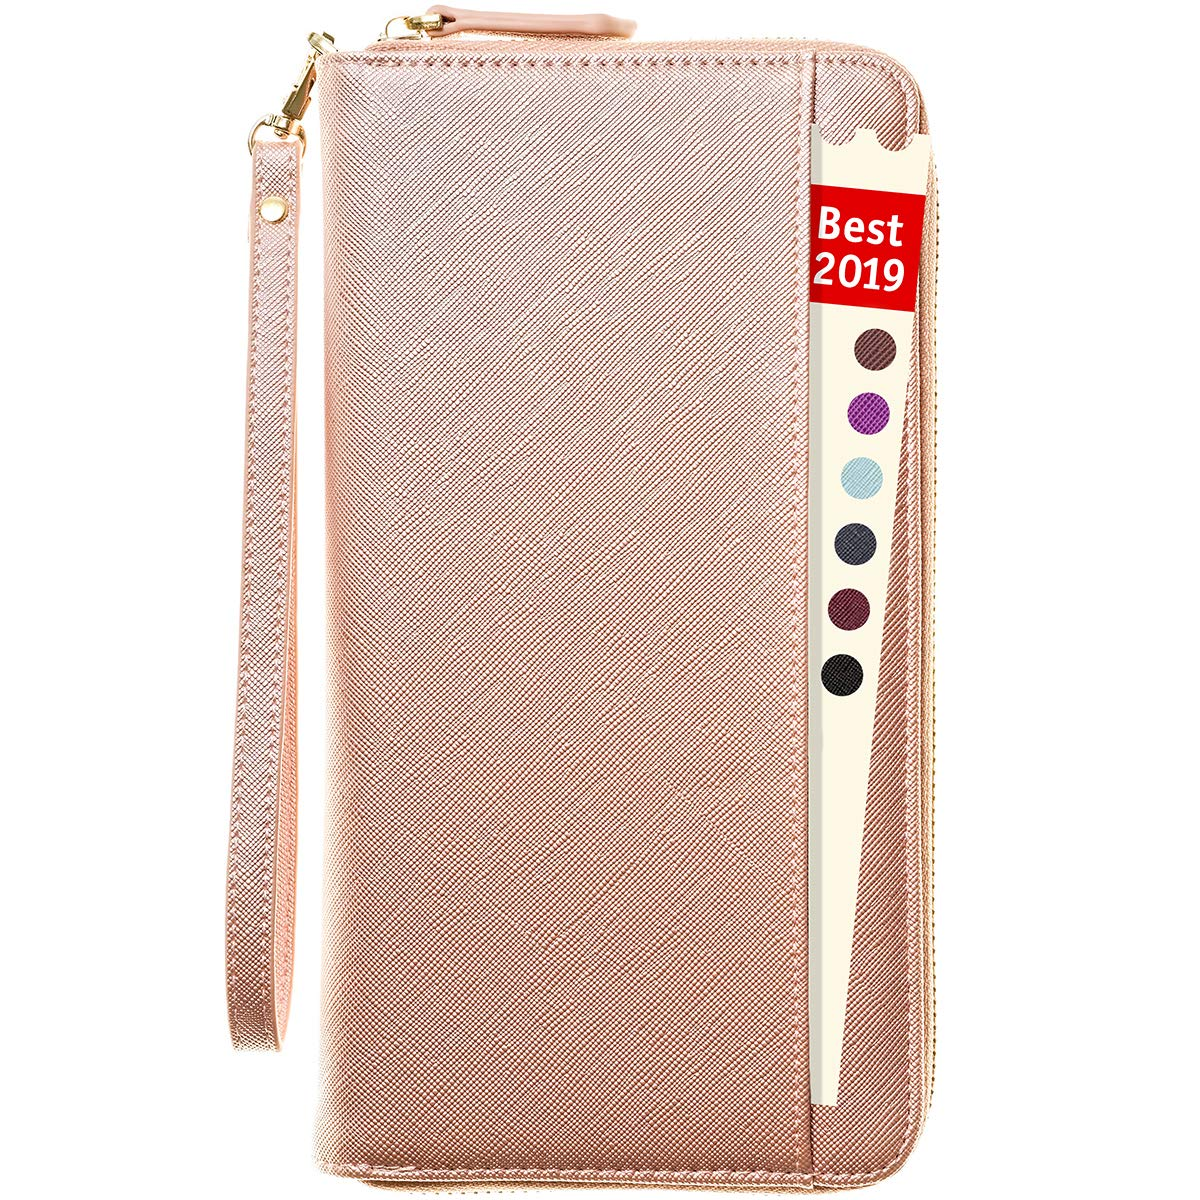 2ee007b776d9 Travel Document Organizer - RFID Passport Wallet Case Family Holder Id  Wristlet (Rose Gold)